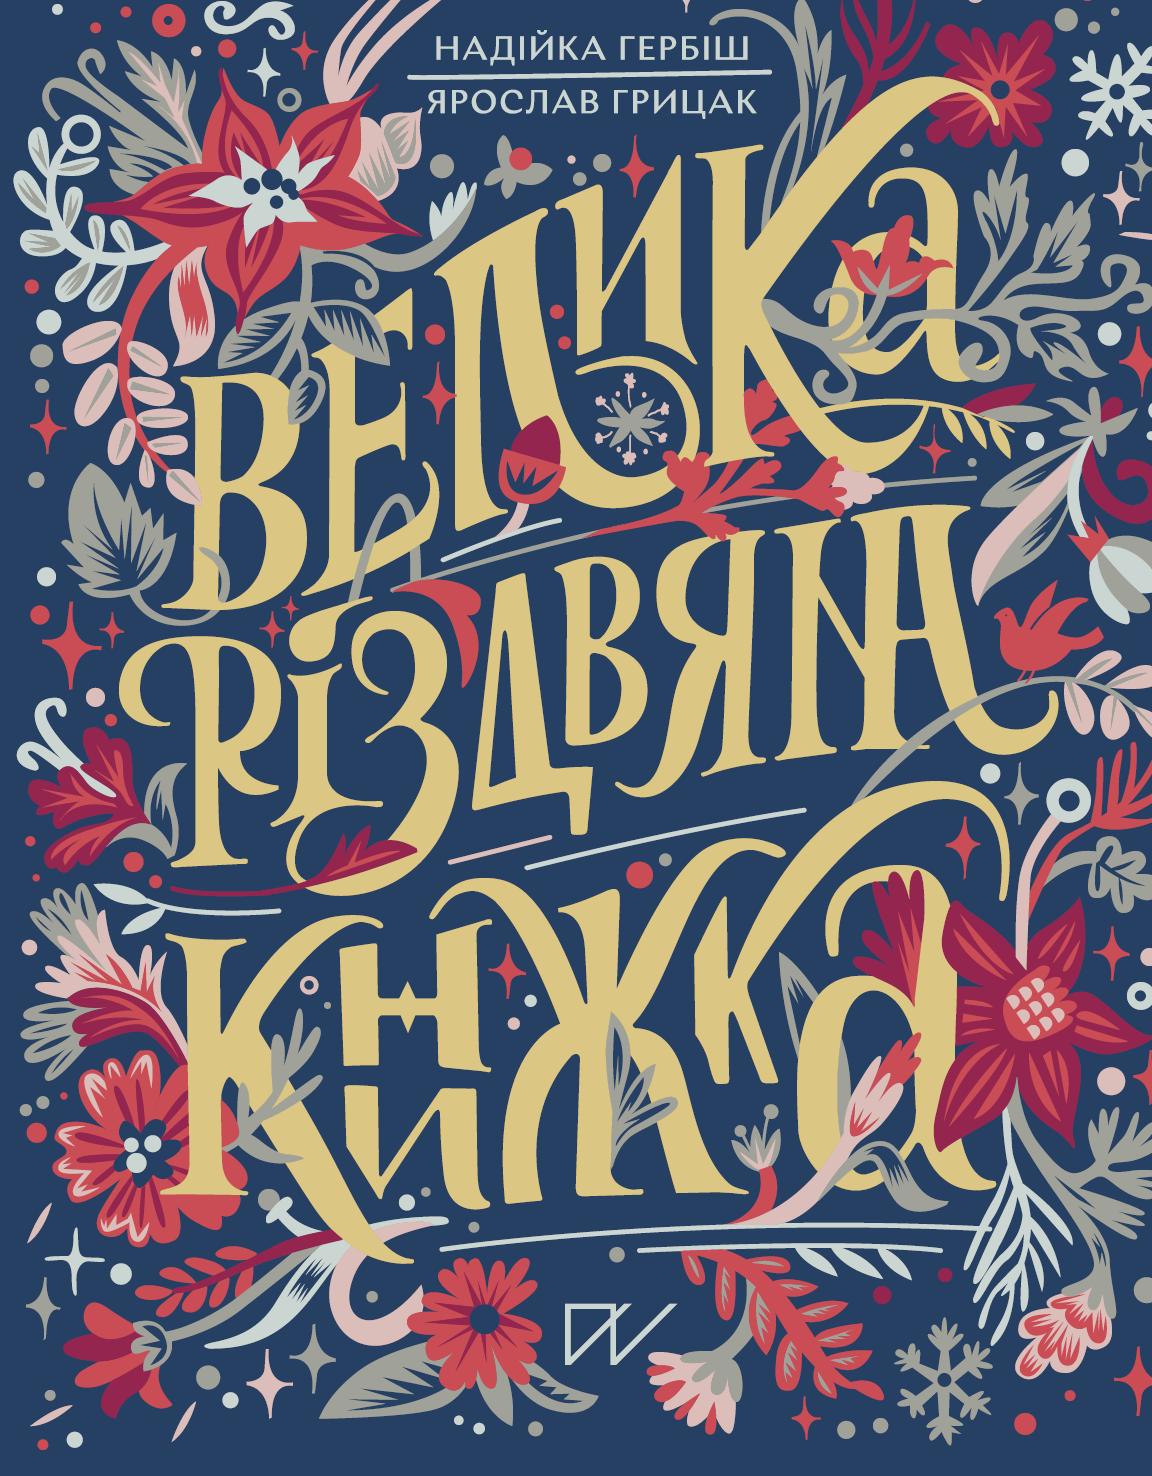 Ярослав Грицак Велика різдвяна книжка